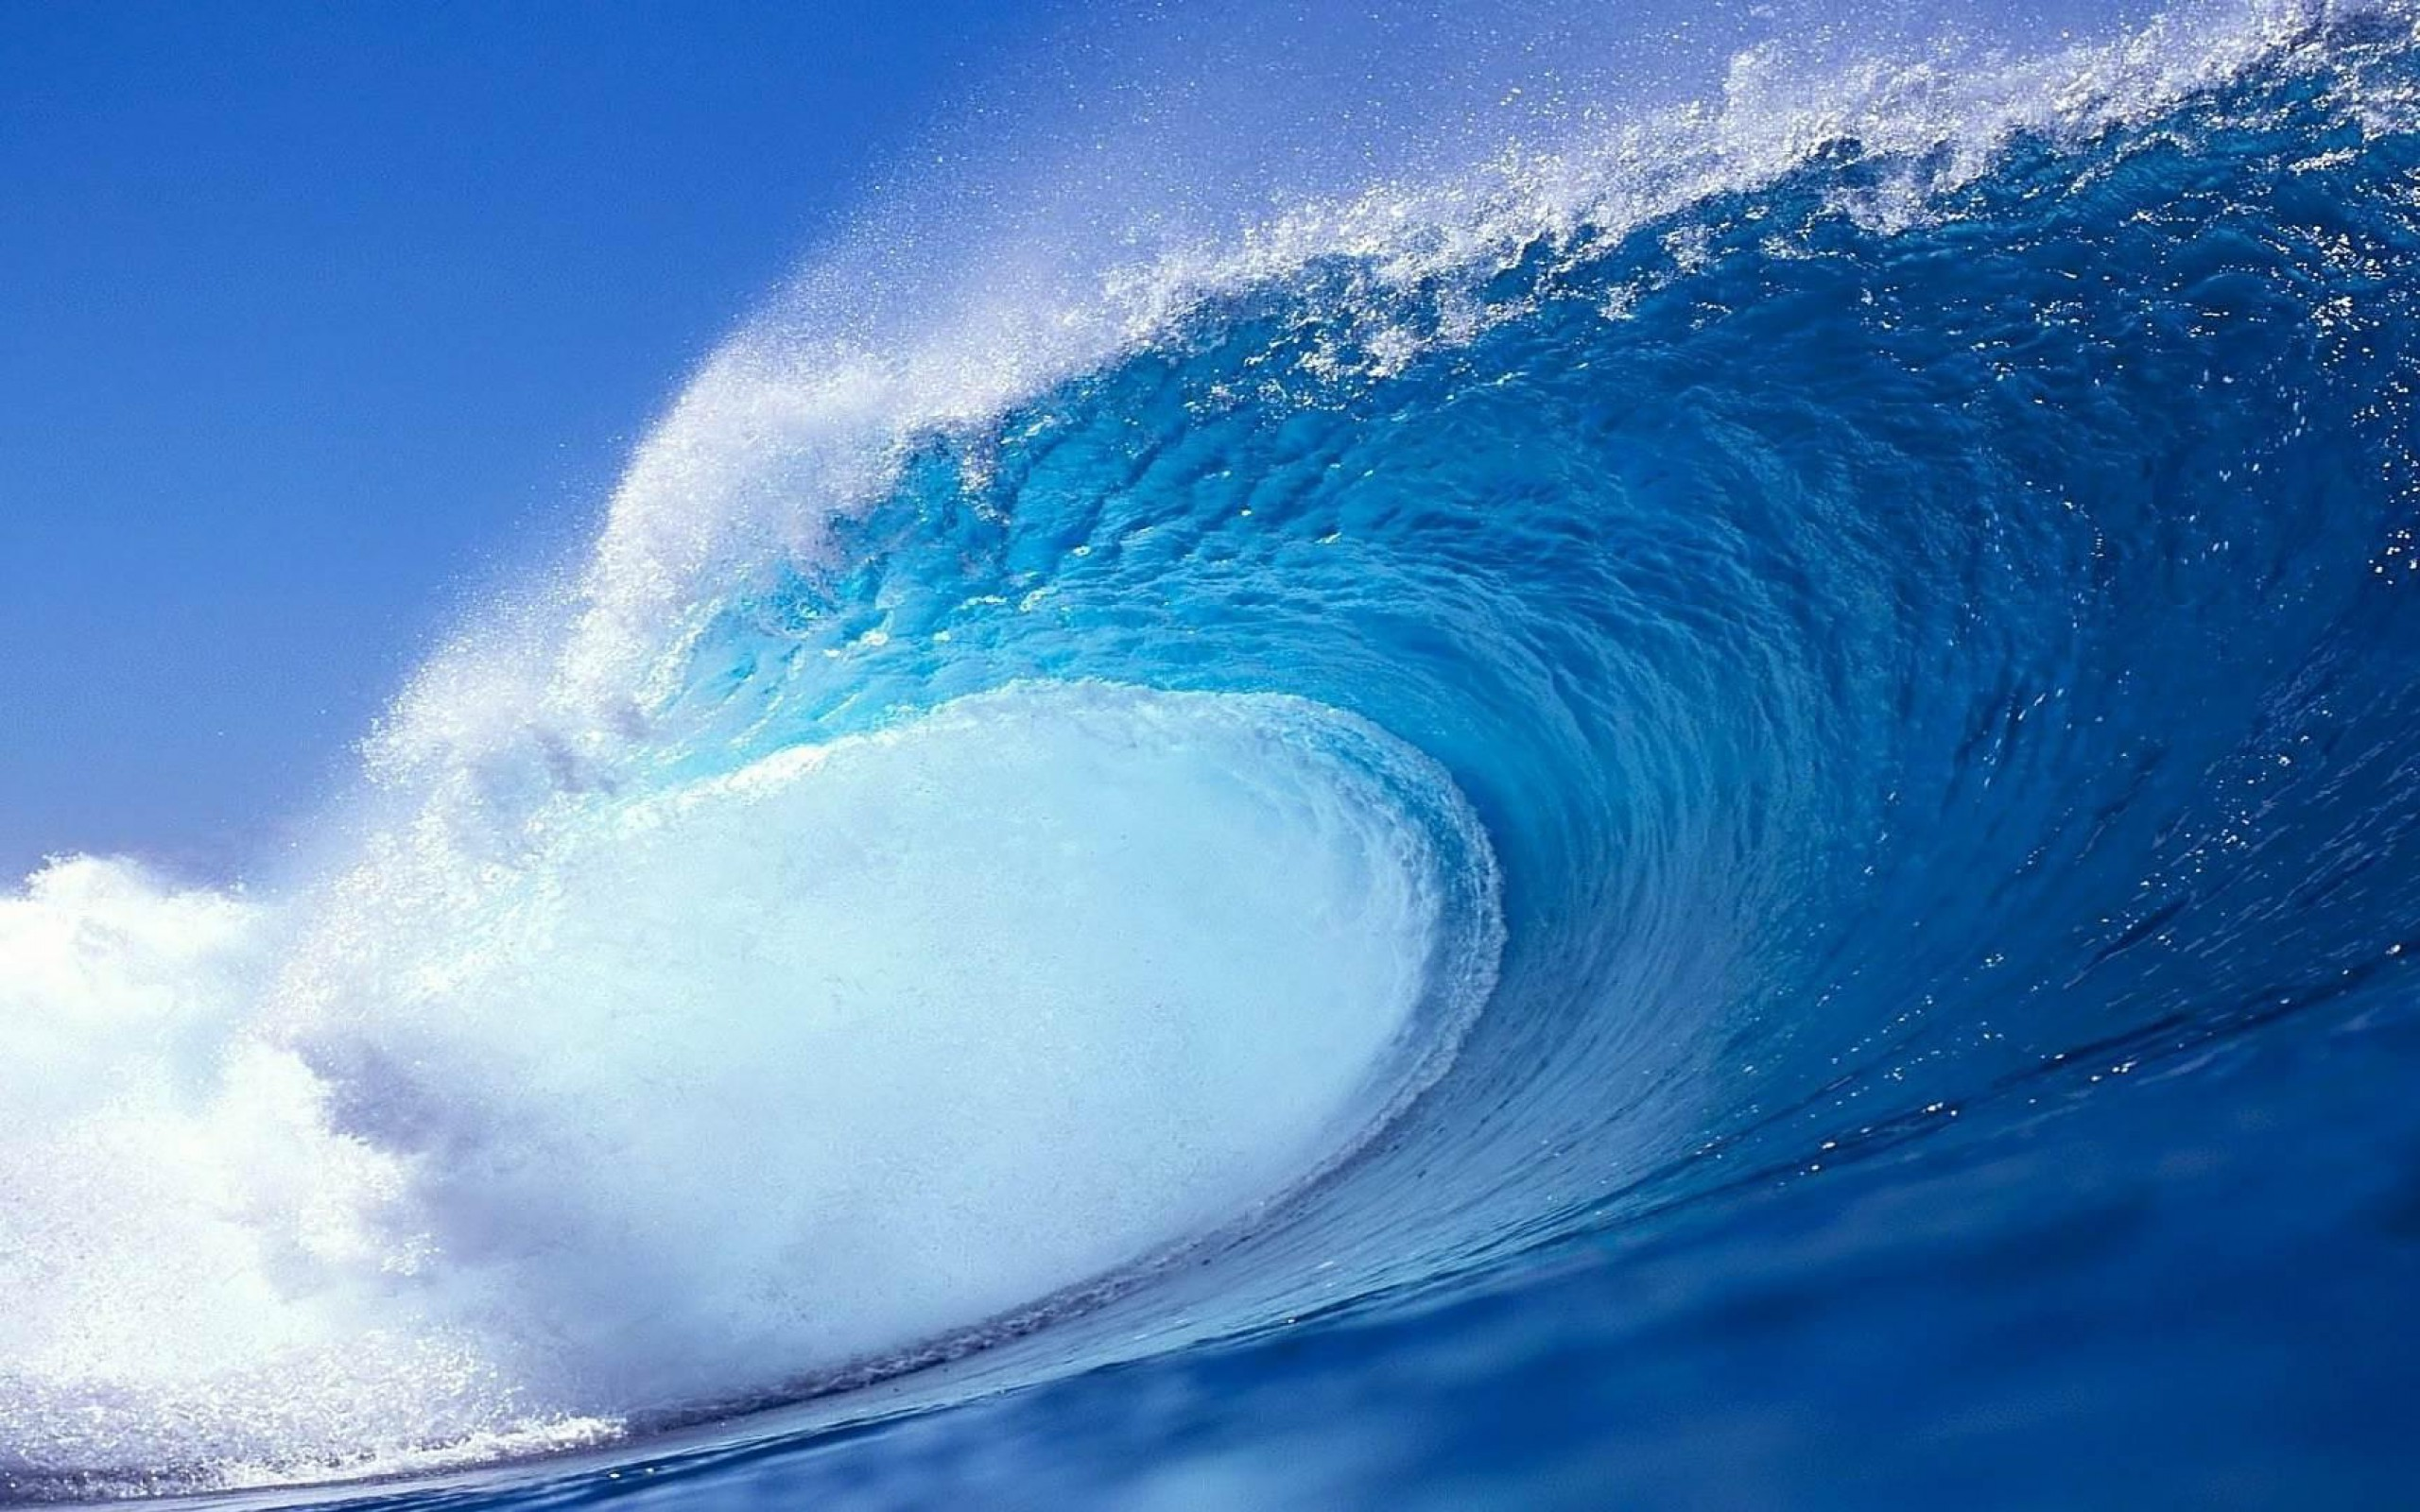 Ocean Waves Wallpaper: Water Ocean Wave Wallpaper Px Free Download 2560x1600px